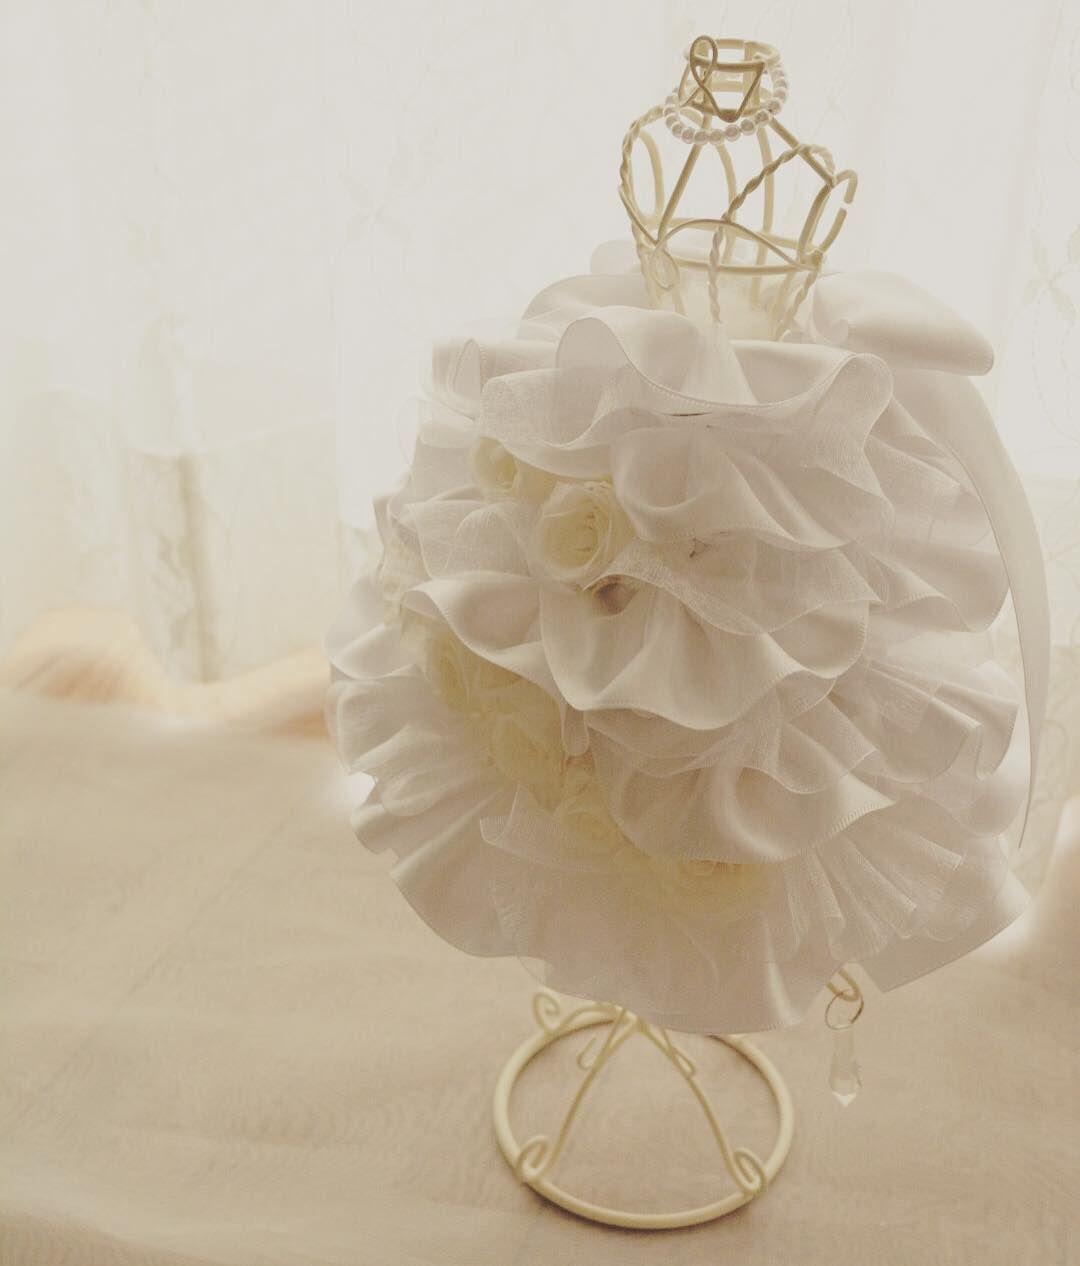 908068ba7de43 100均素材で作れる!花びらドレスのミニトルソーが可愛い